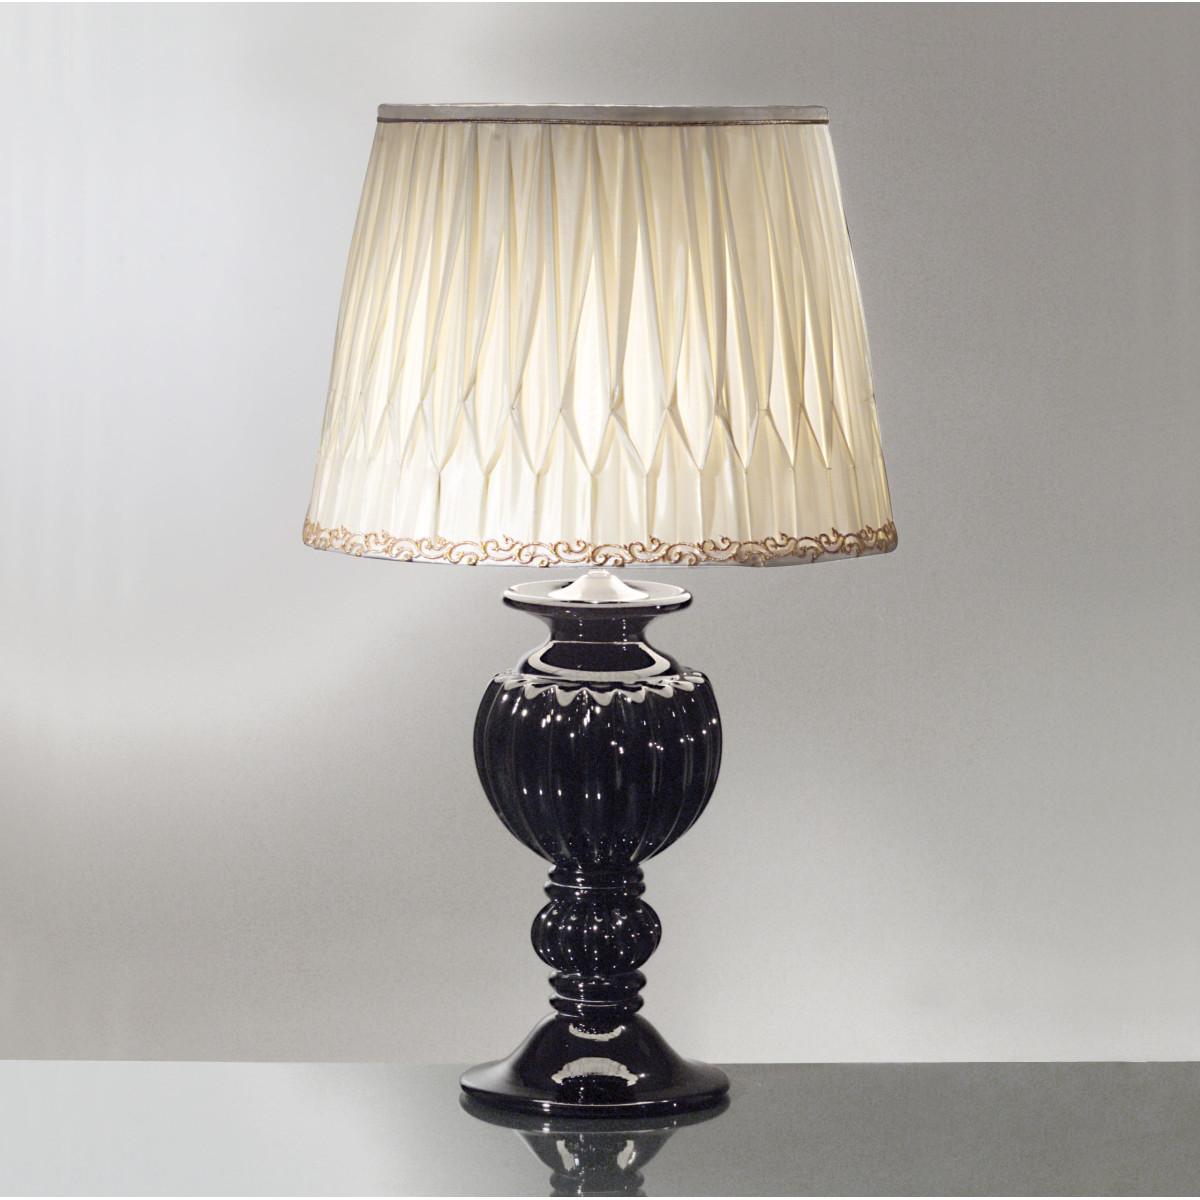 """Tersicore"" lampara de sobremesa de cristal de Murano - 1 luz - negro"